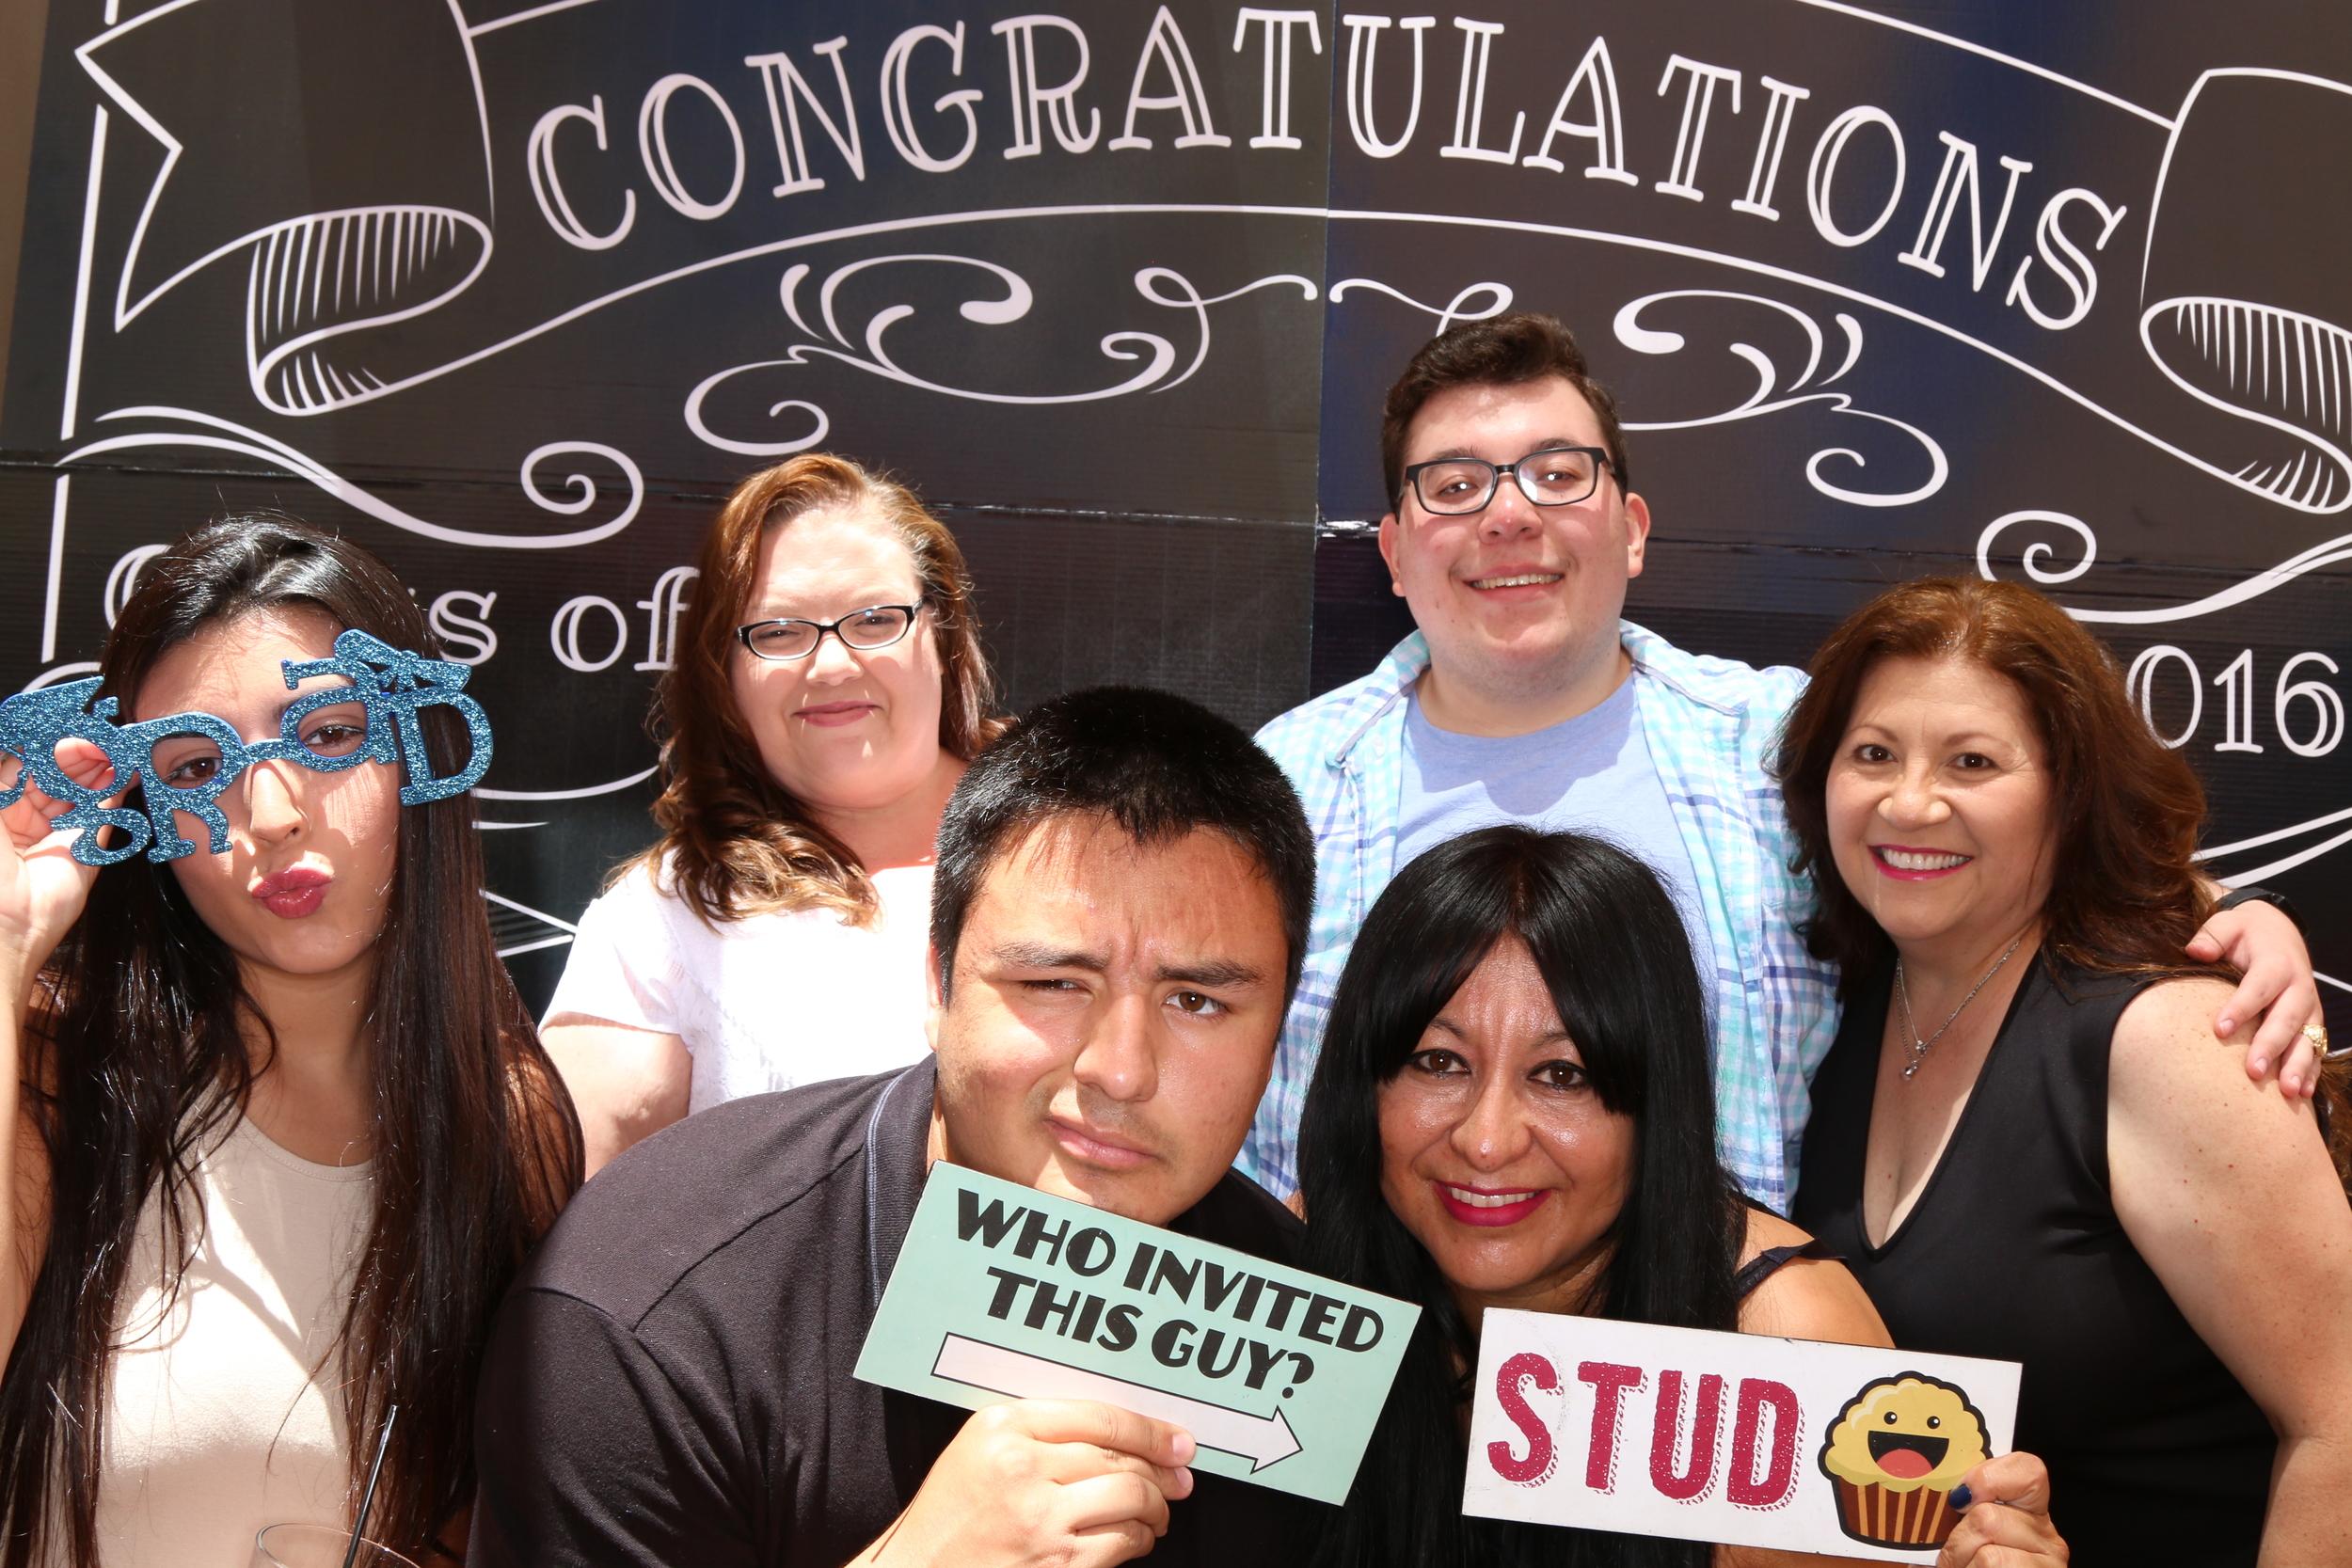 Ricky's College Graduation